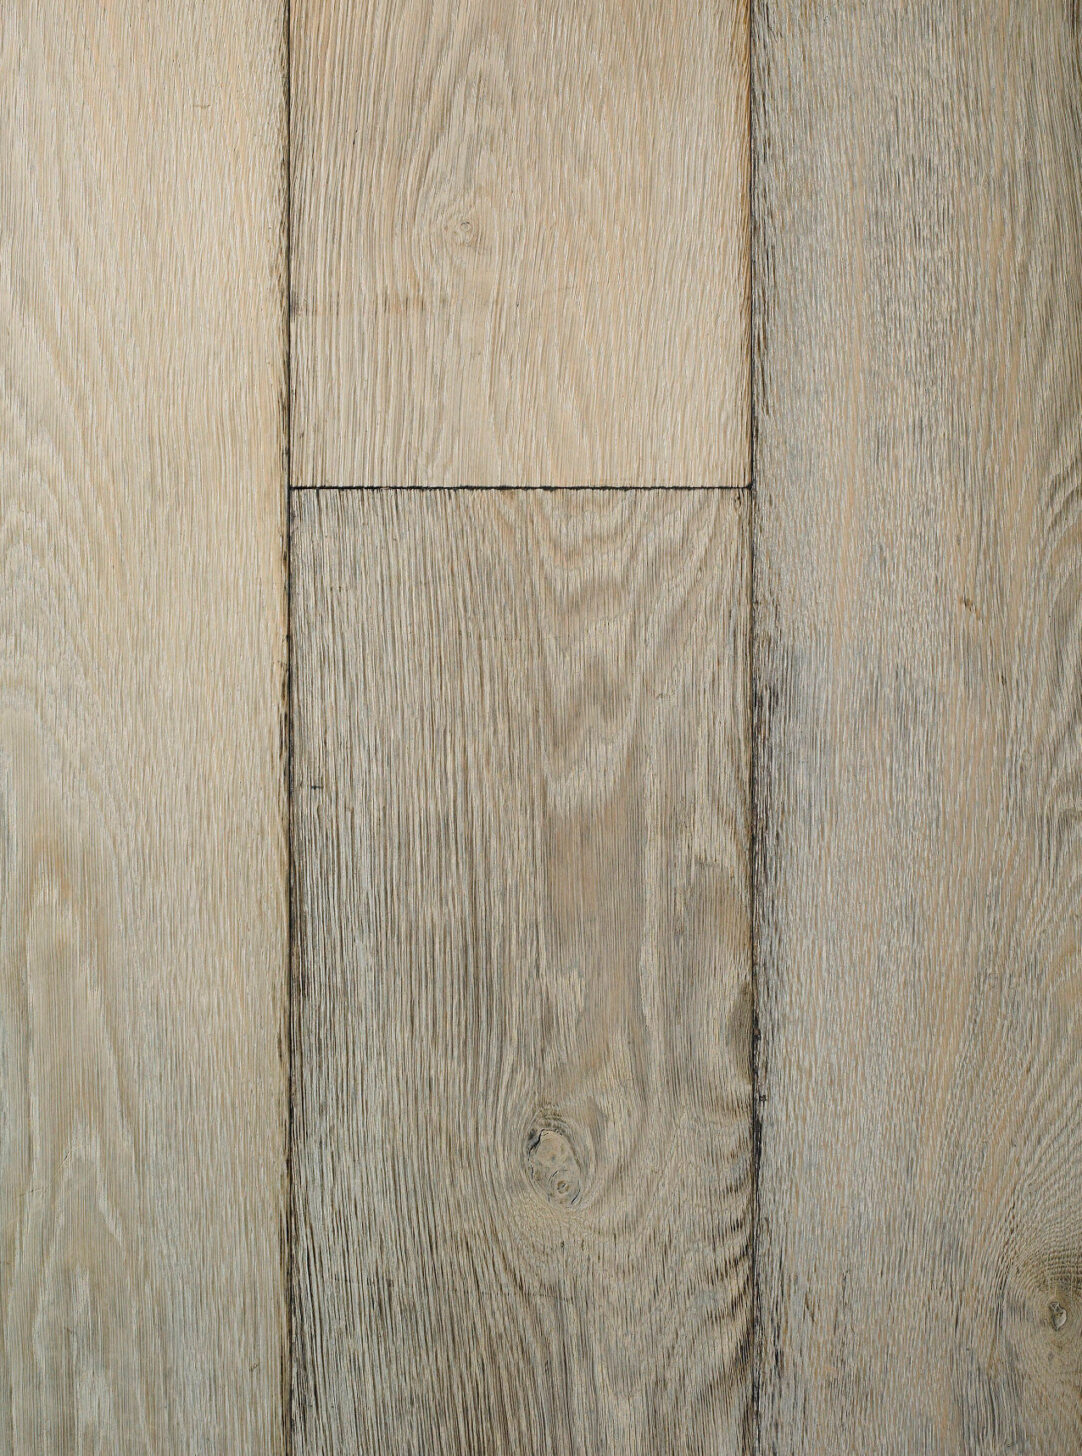 Oak magma vesuvius plank